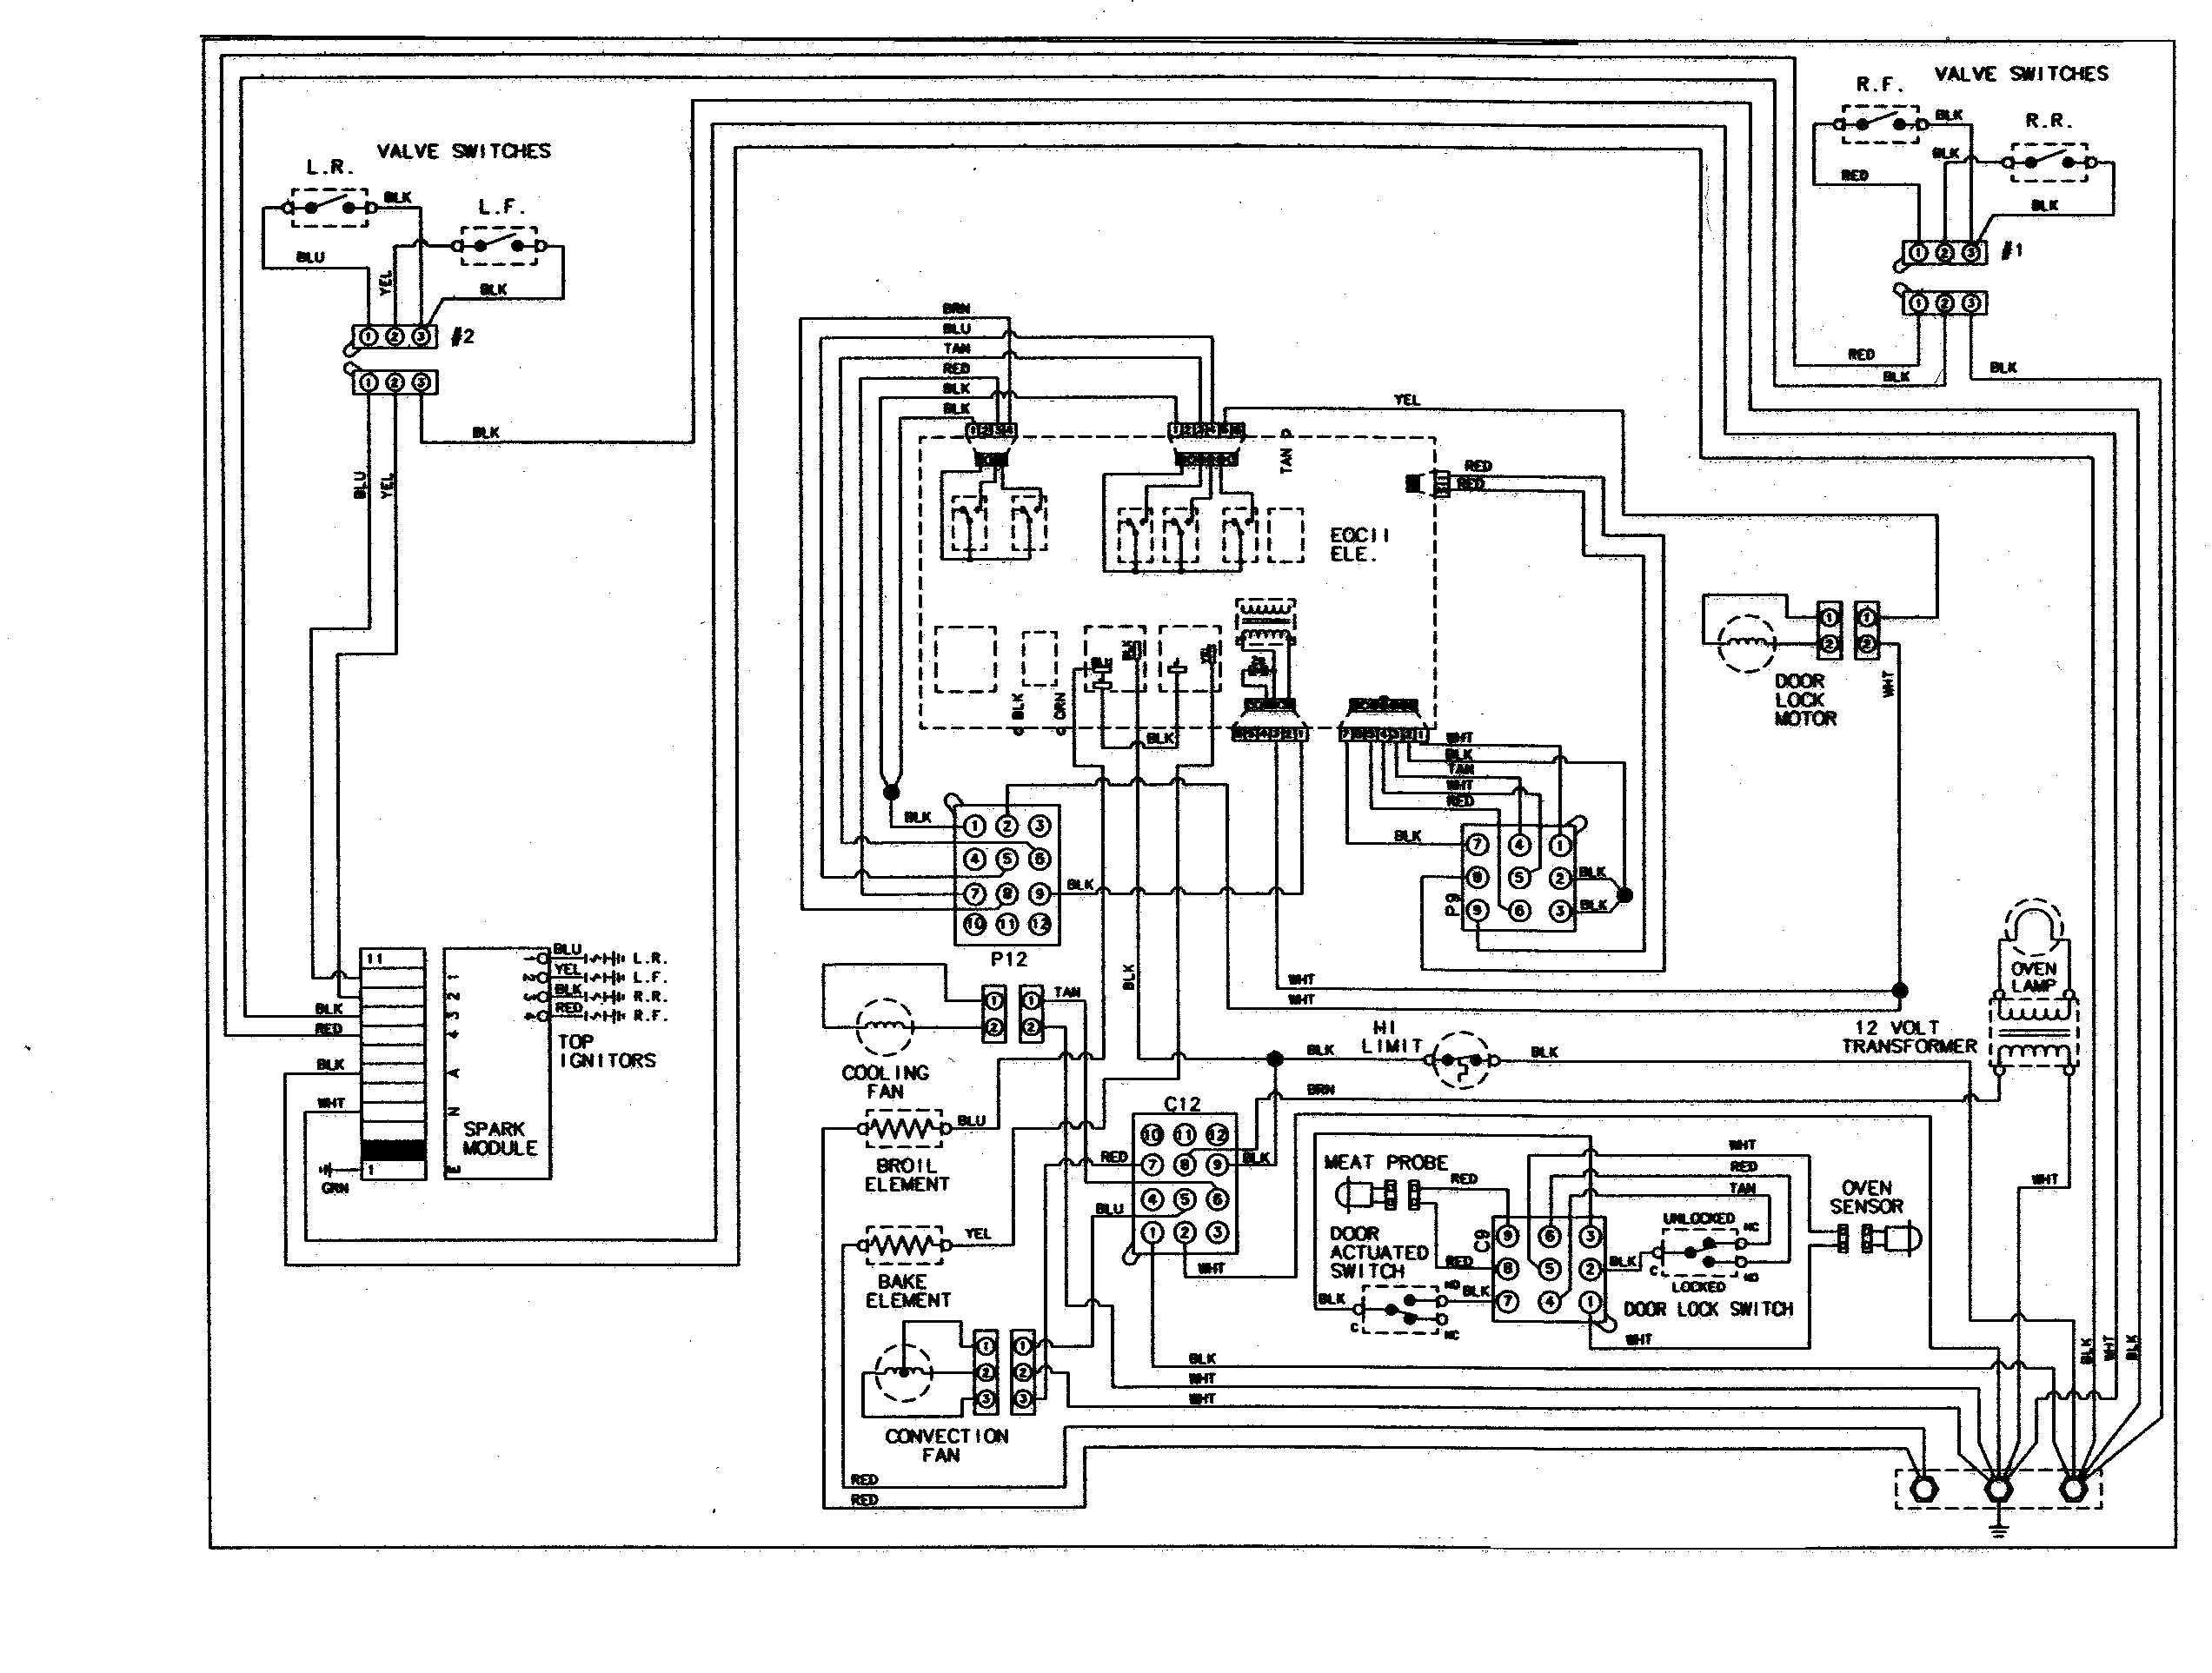 Ge Cooktop Wiring Diagram - Wiring Diagrams Click - Ge Stove Wiring Diagram